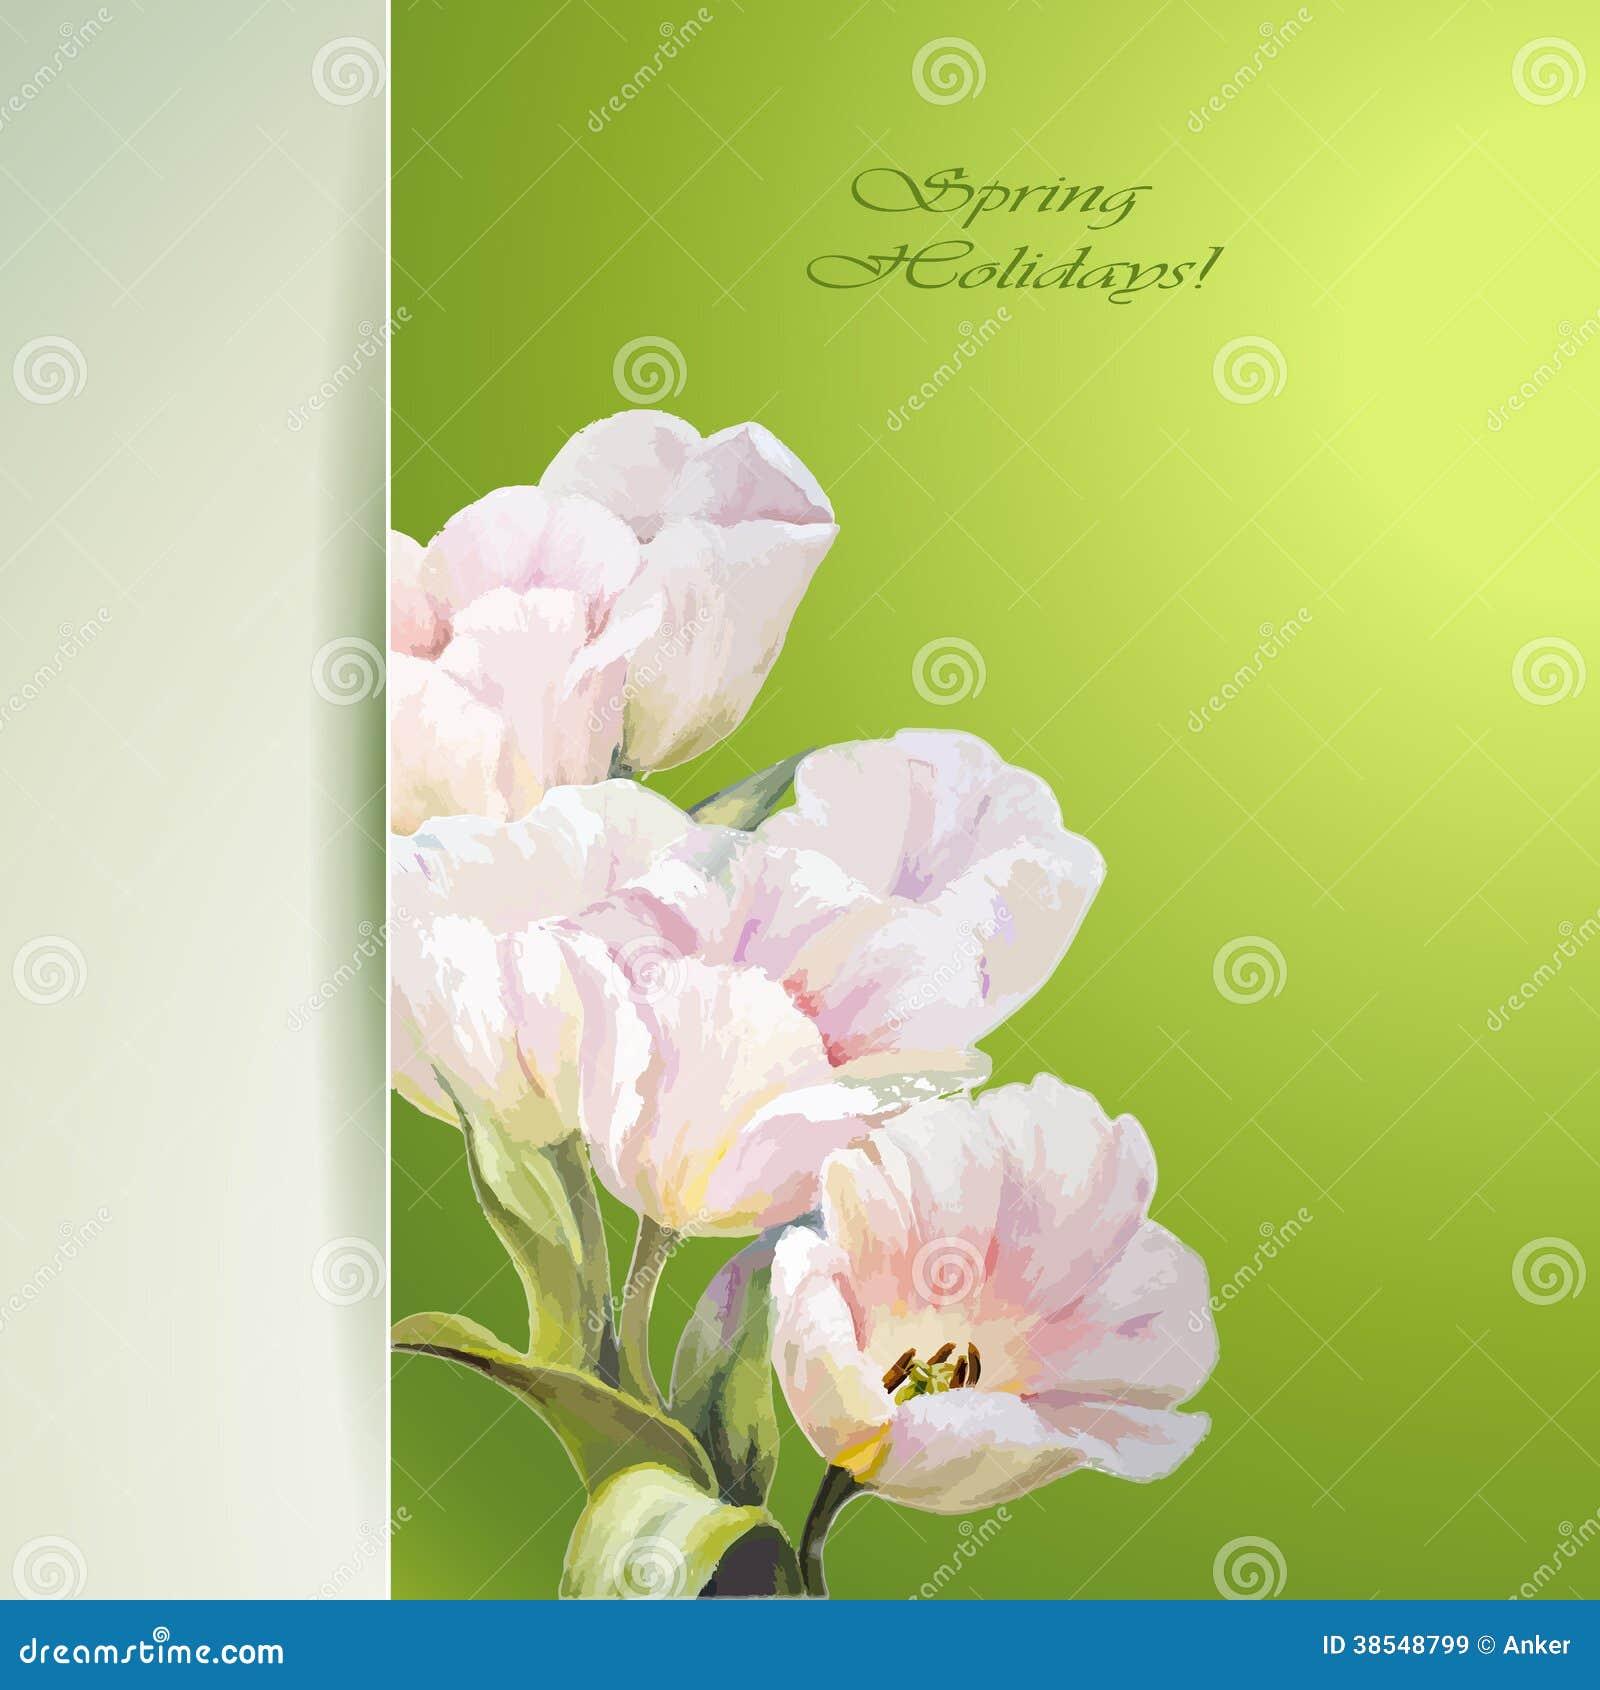 spring invitation template